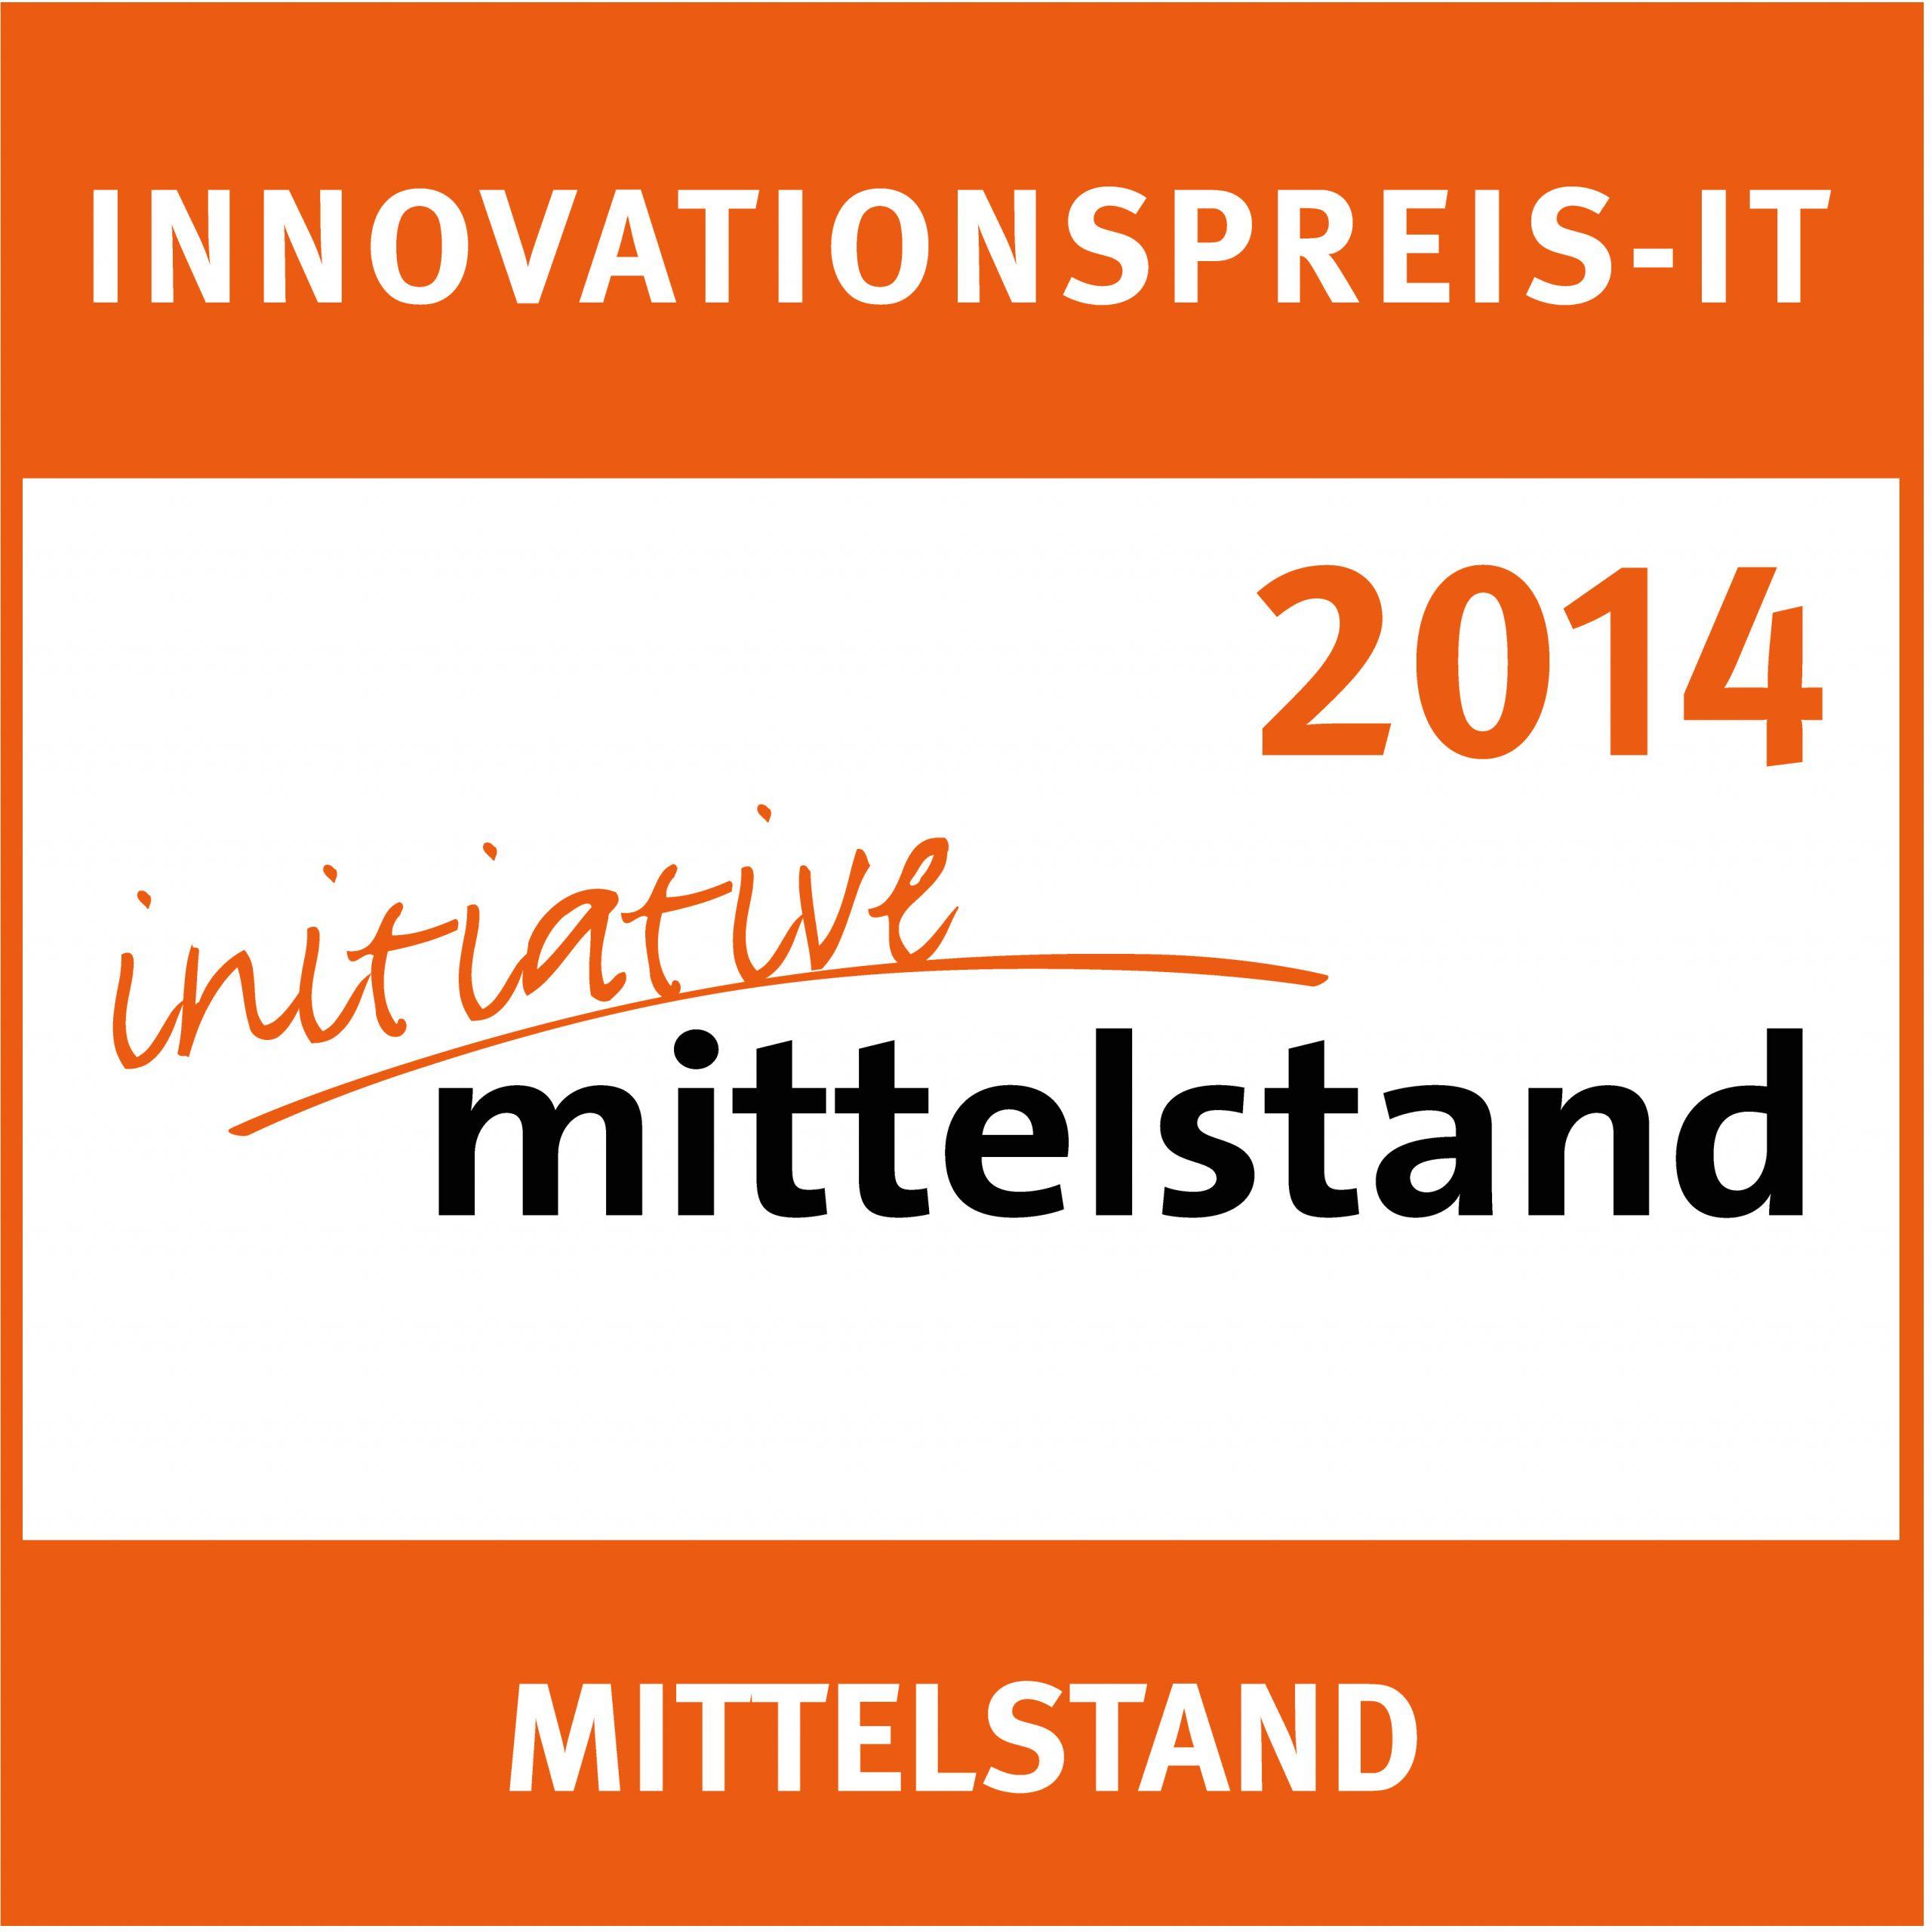 innovationspreisit logo 2014 3500px jpg